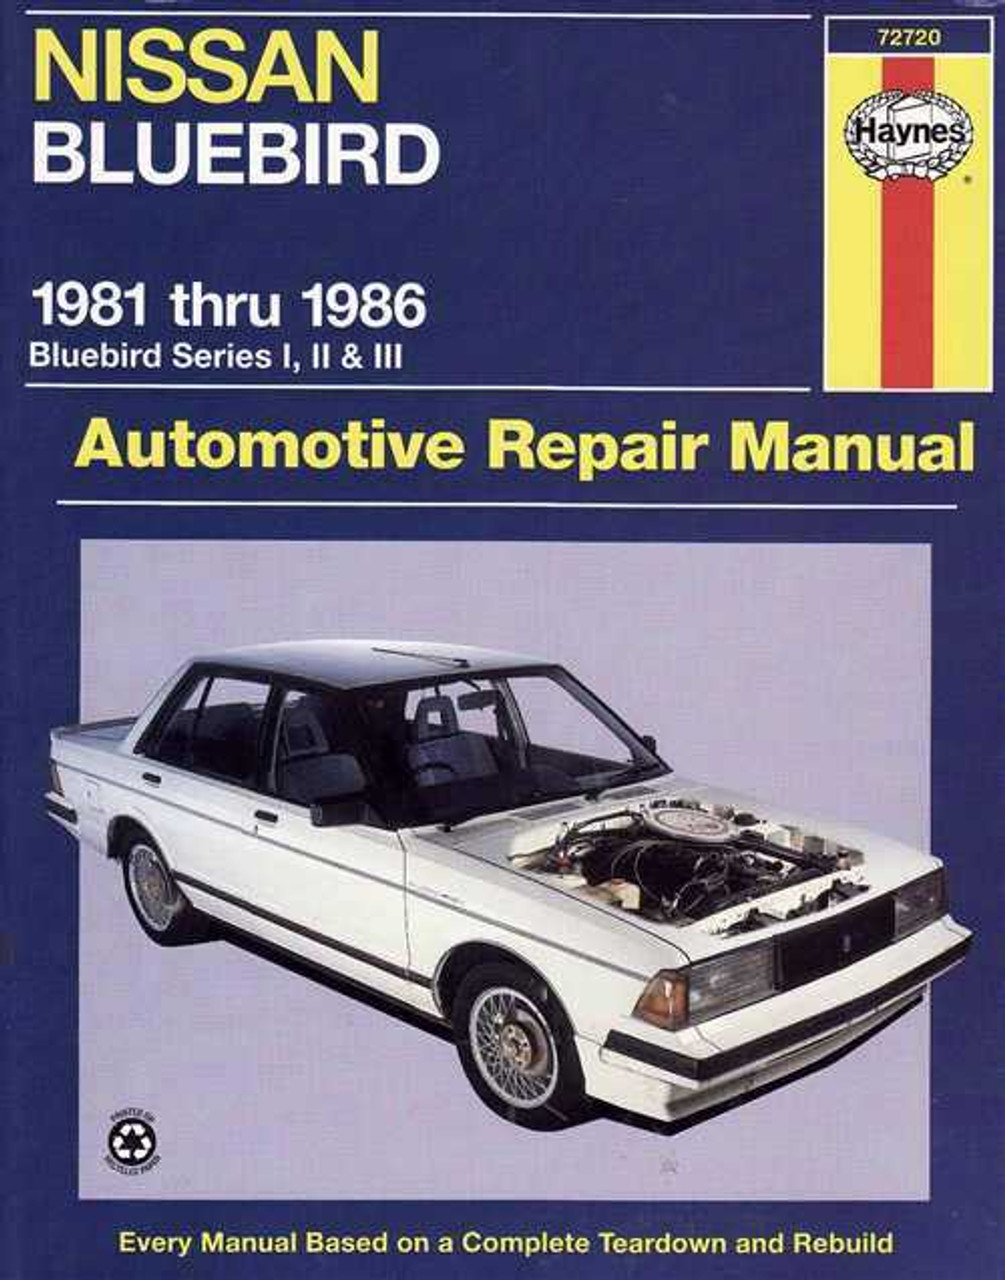 nissan bluebird series 1 2 amp 3 1981 1986 workshop manual rh automotobookshop com au